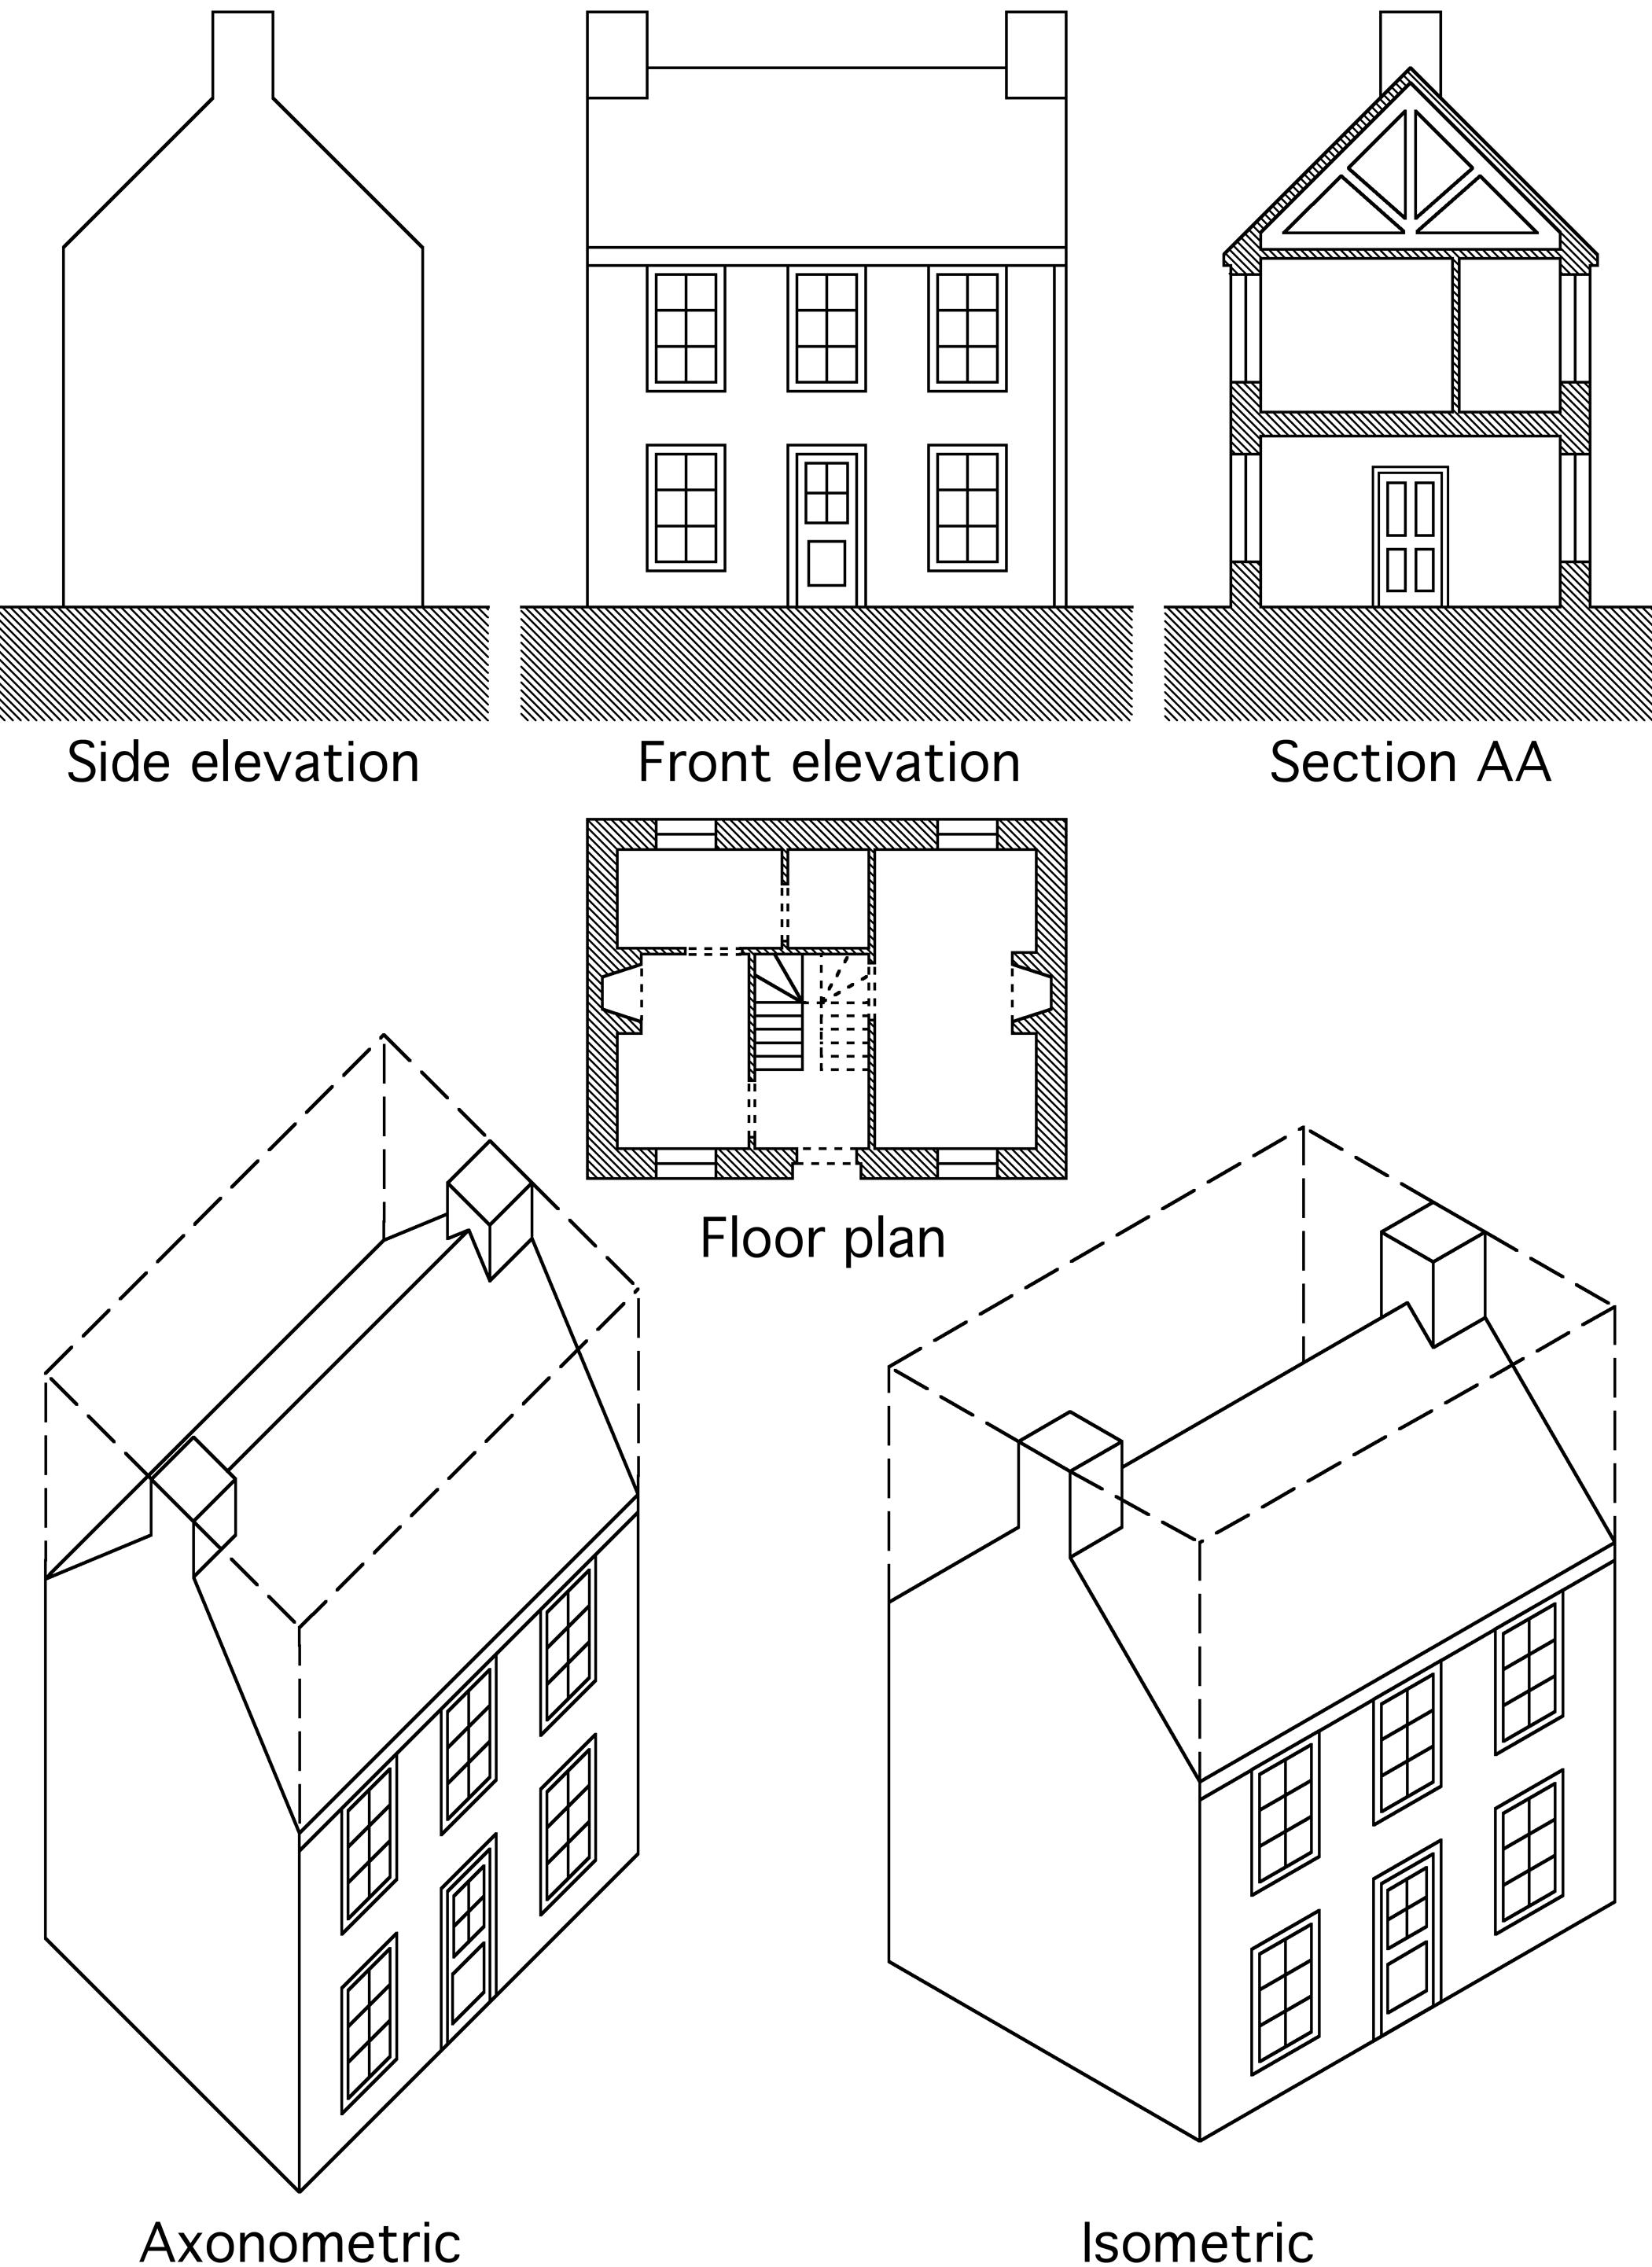 Haoran Harry Gong Dibujo De Arquitectura Tipos De Dibujo Tecnico Planos De Arquitectura